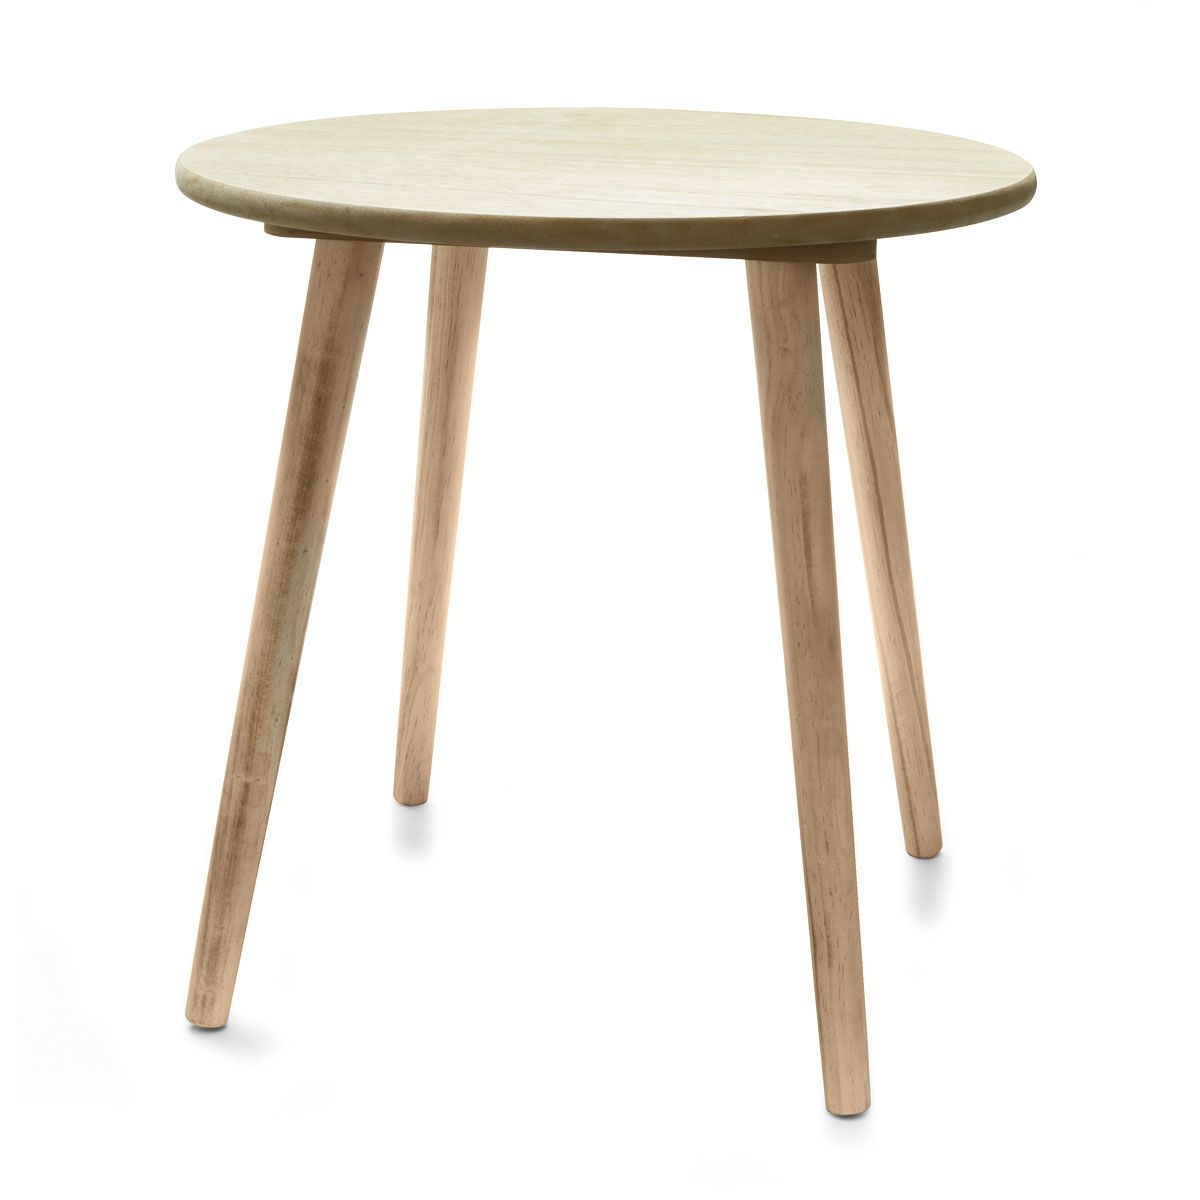 Side table natural kmart upstairs livingroom pinterest side table natural kmart greentooth Choice Image